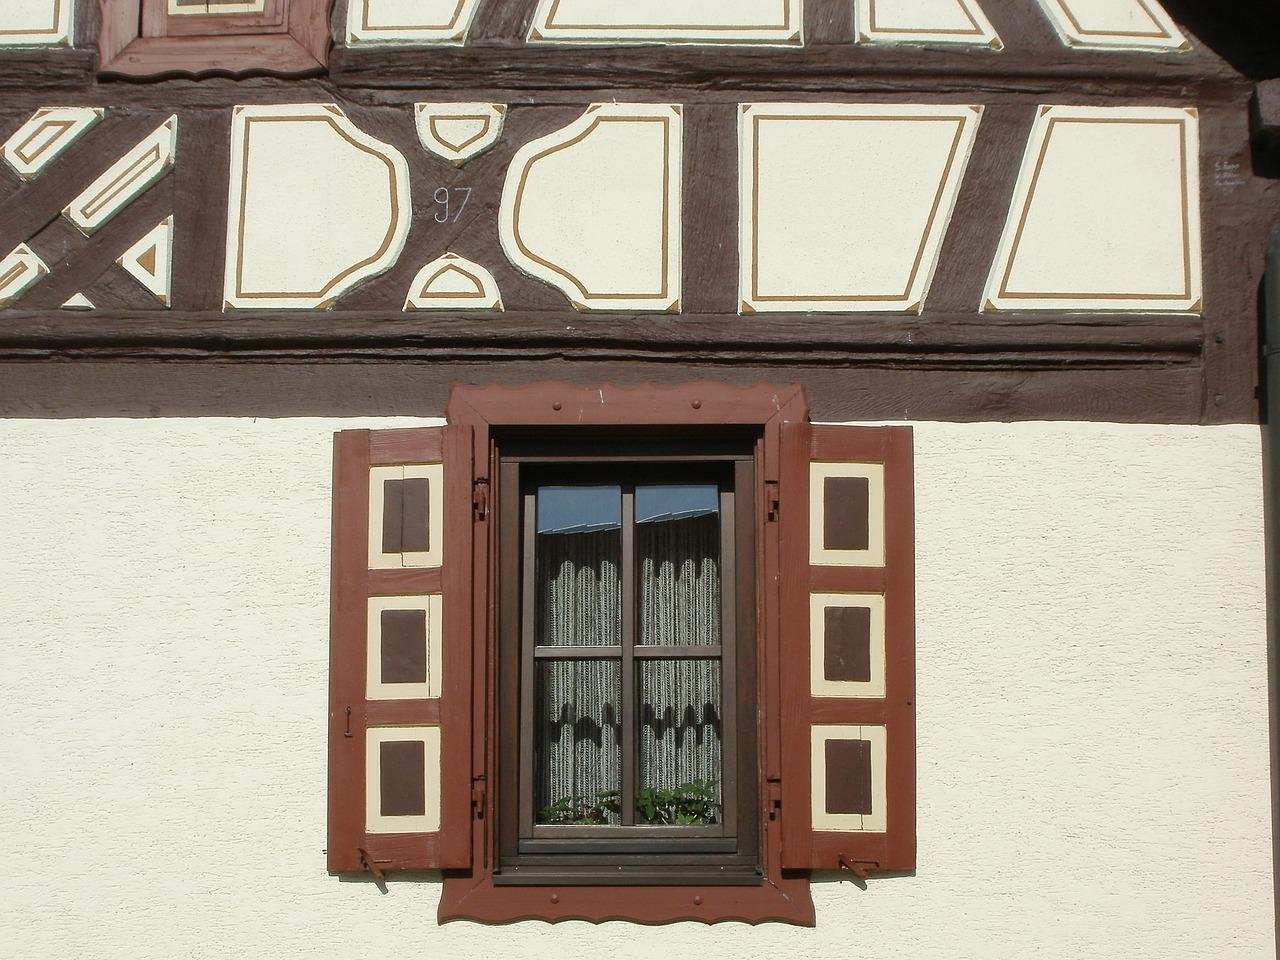 window-837755_1280